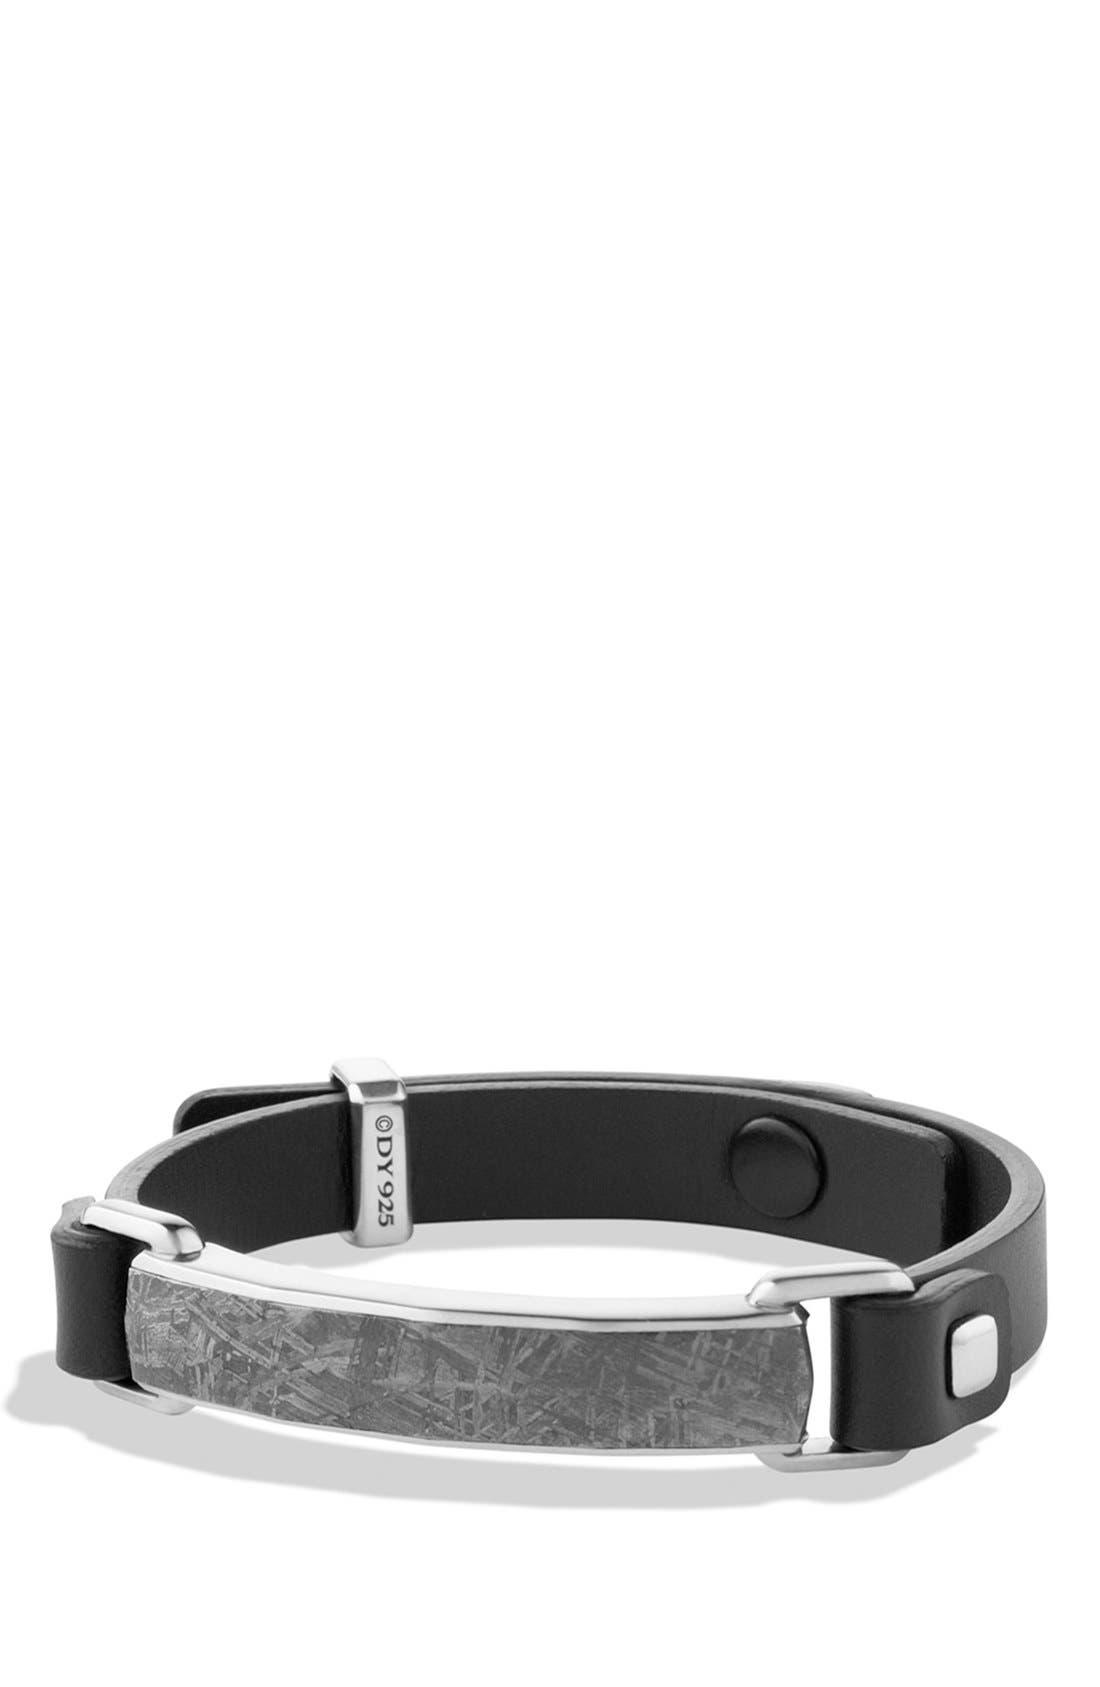 DAVID YURMAN 'Meteorite' Leather ID Bracelet in Black